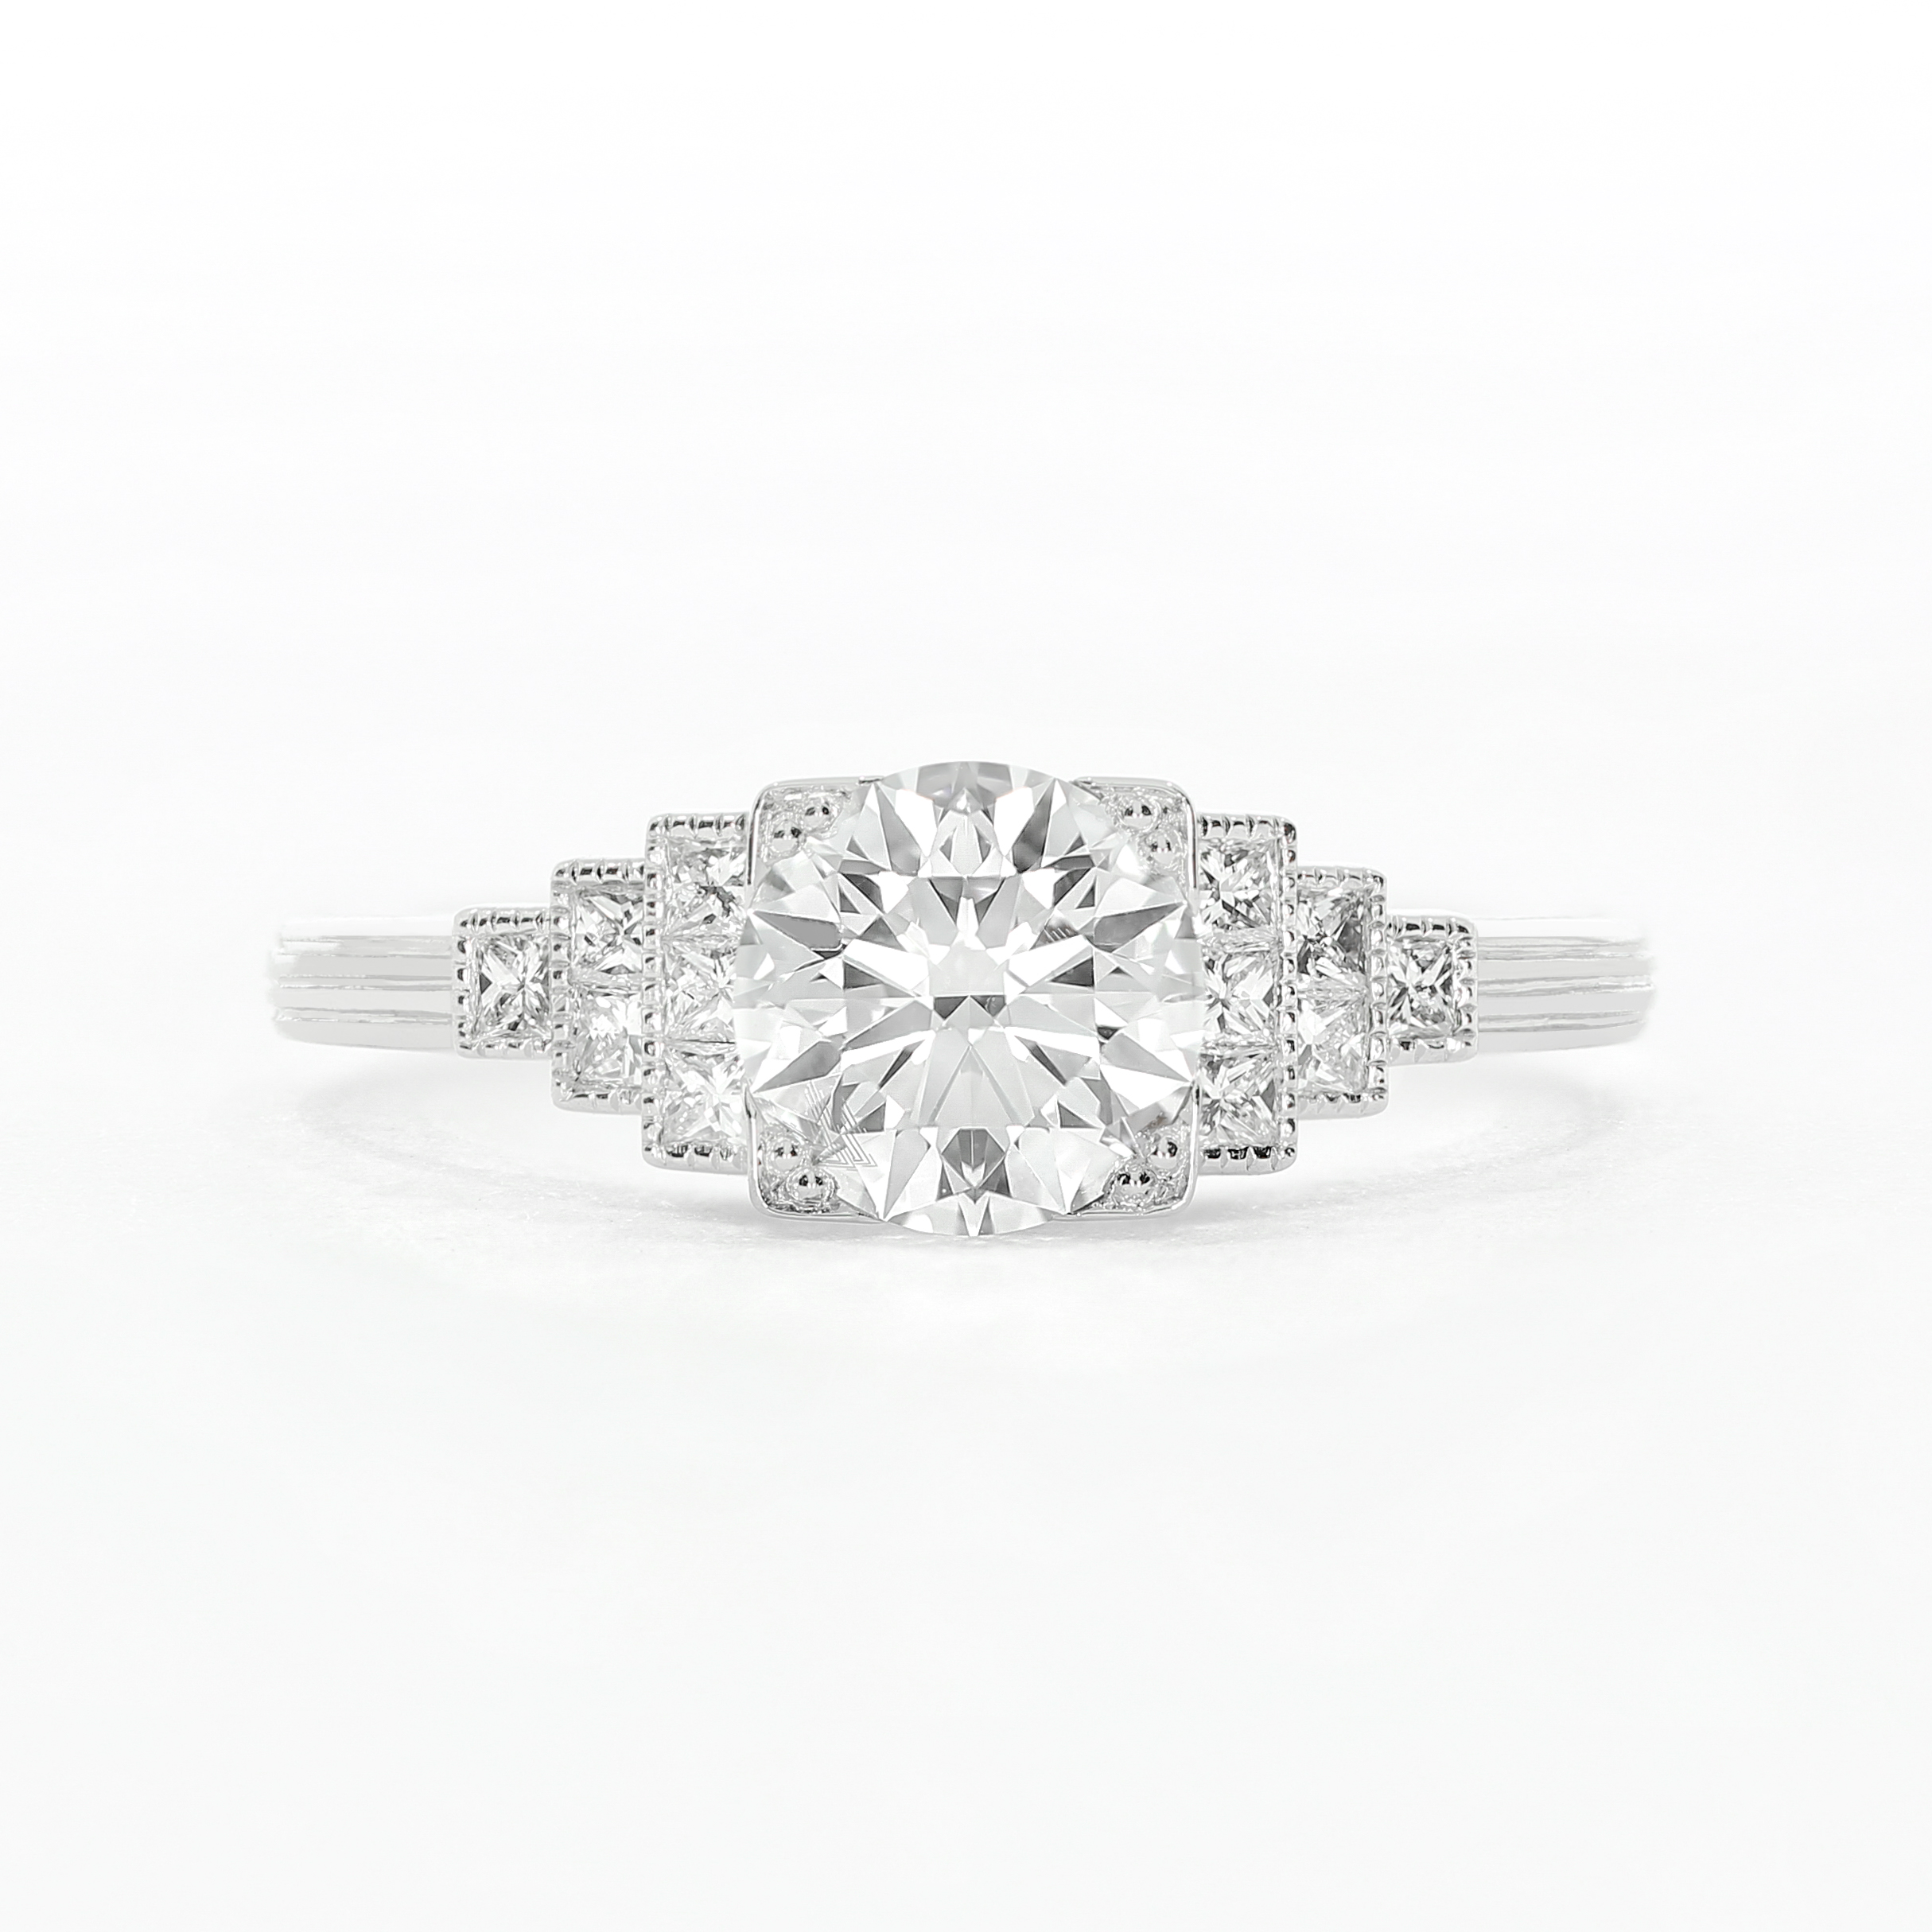 A  bespoke engagement ring  commission, based on Art Deco design